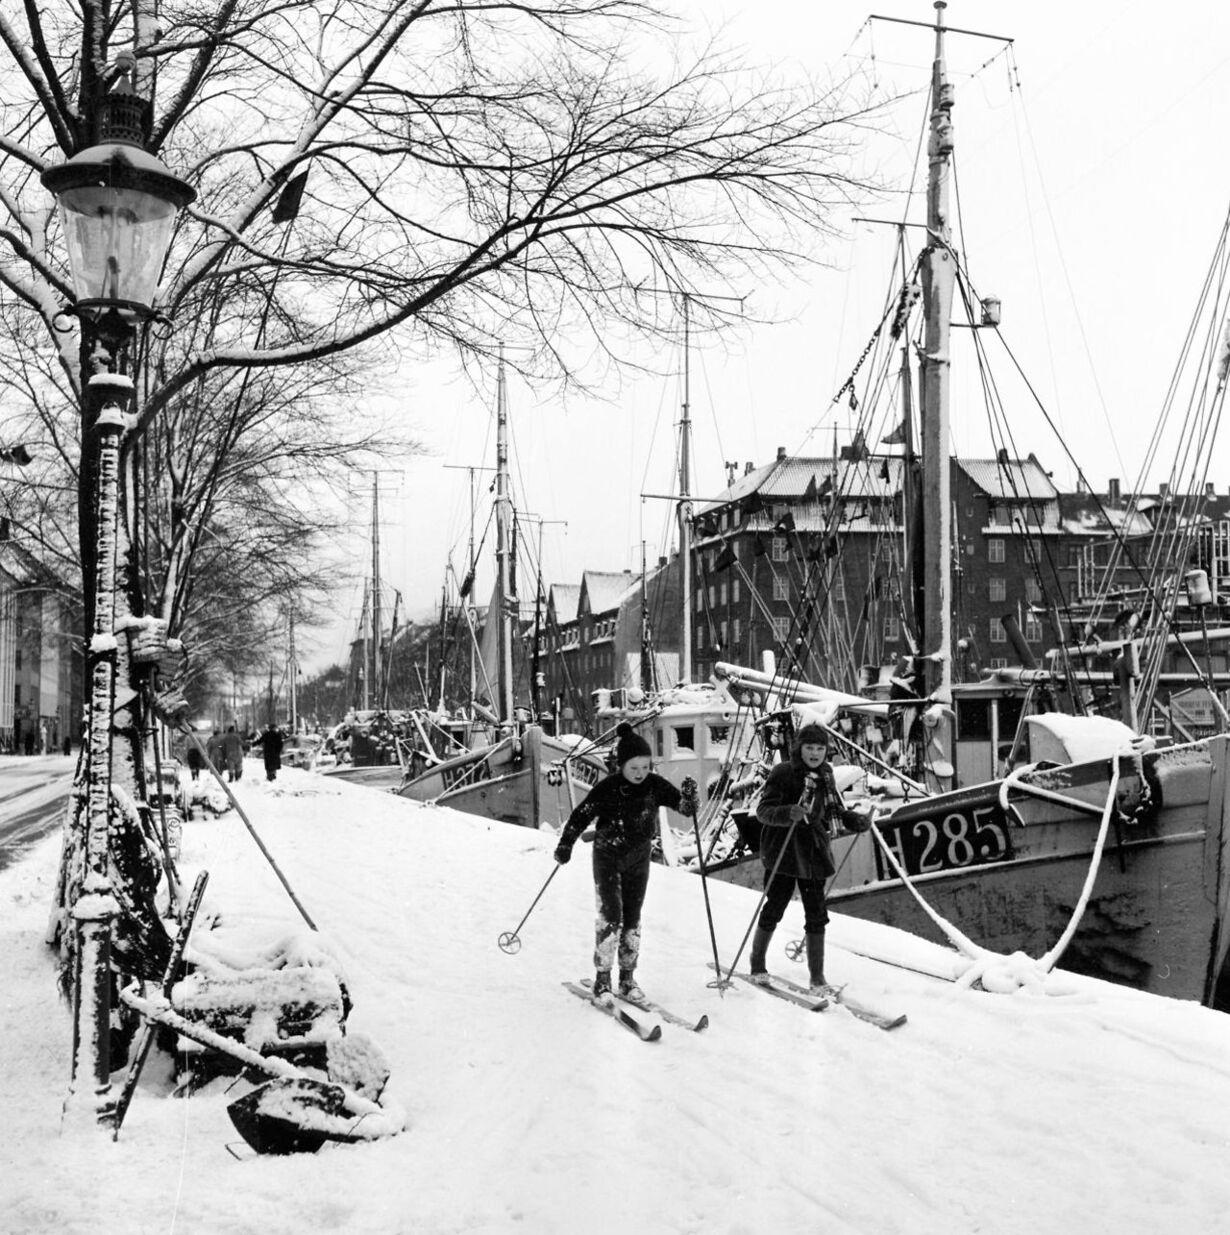 1956 ski